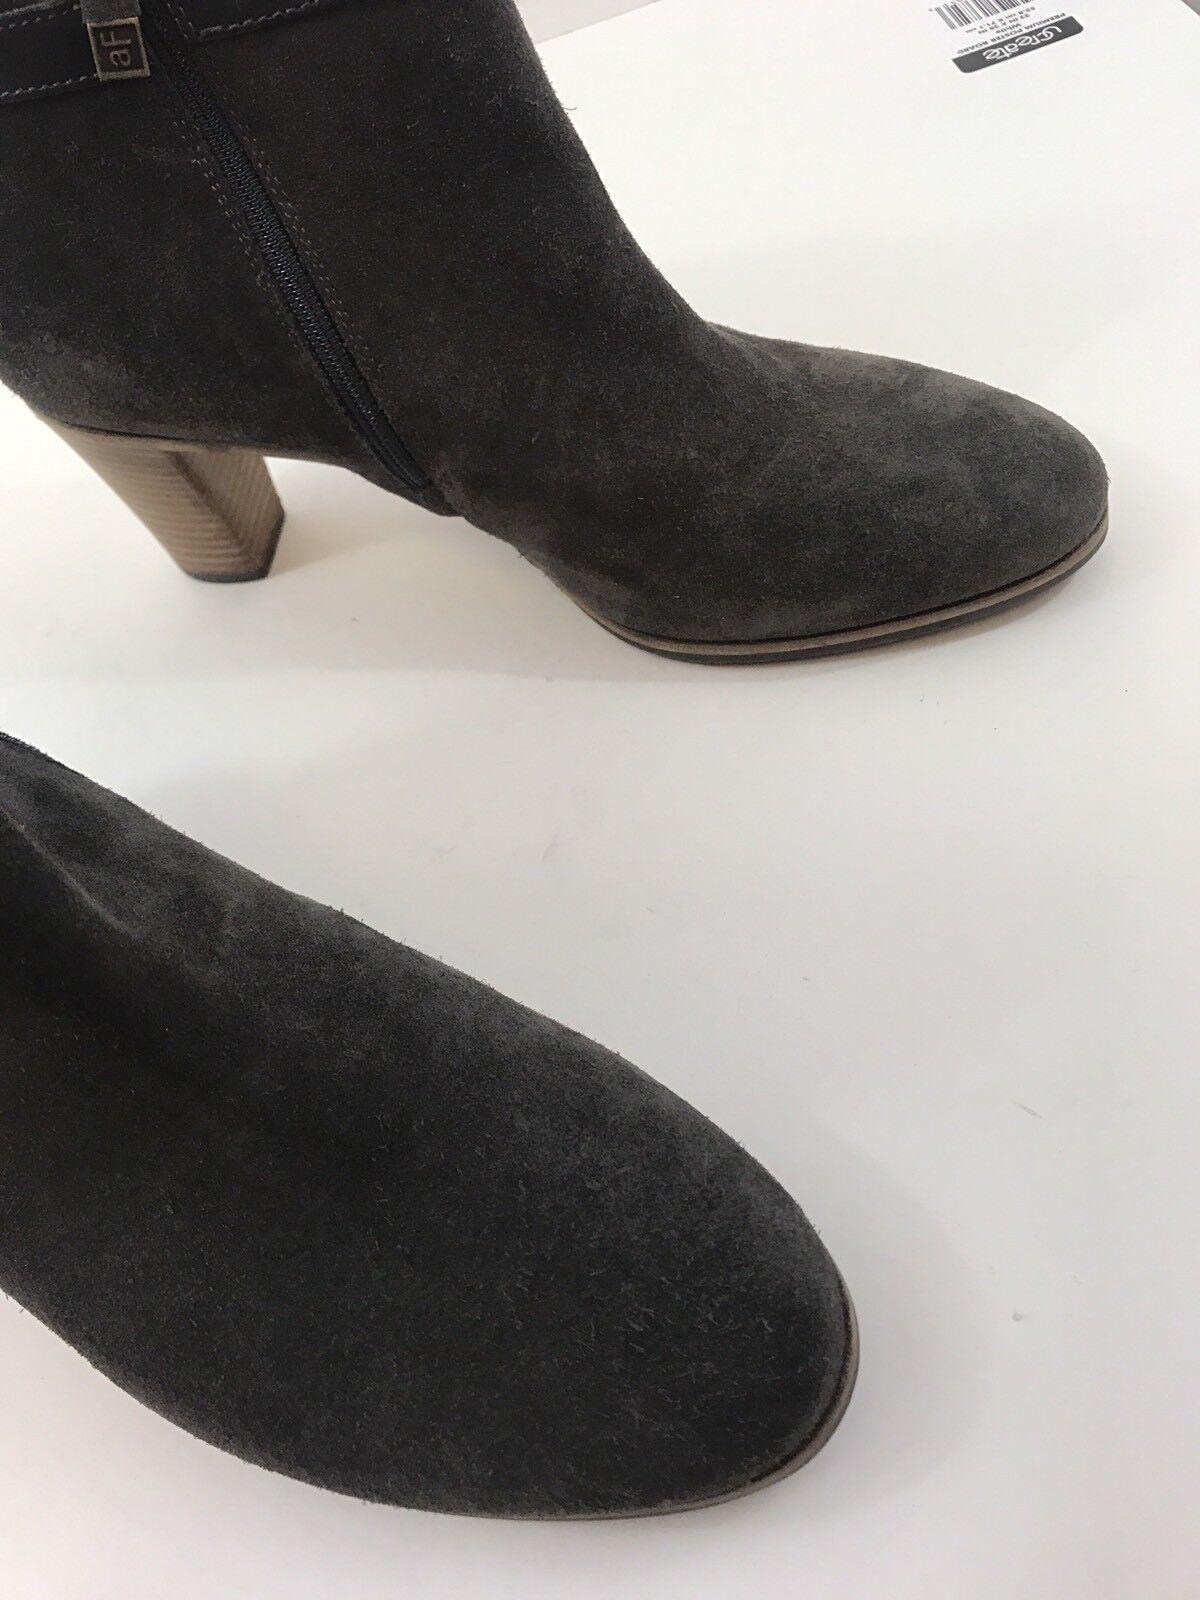 ALBERTO FERMANI  SERRA SUDE Donna SIZE EU #2 40 Grey ANKLE BOOTS zipper #2 EU 4360a9